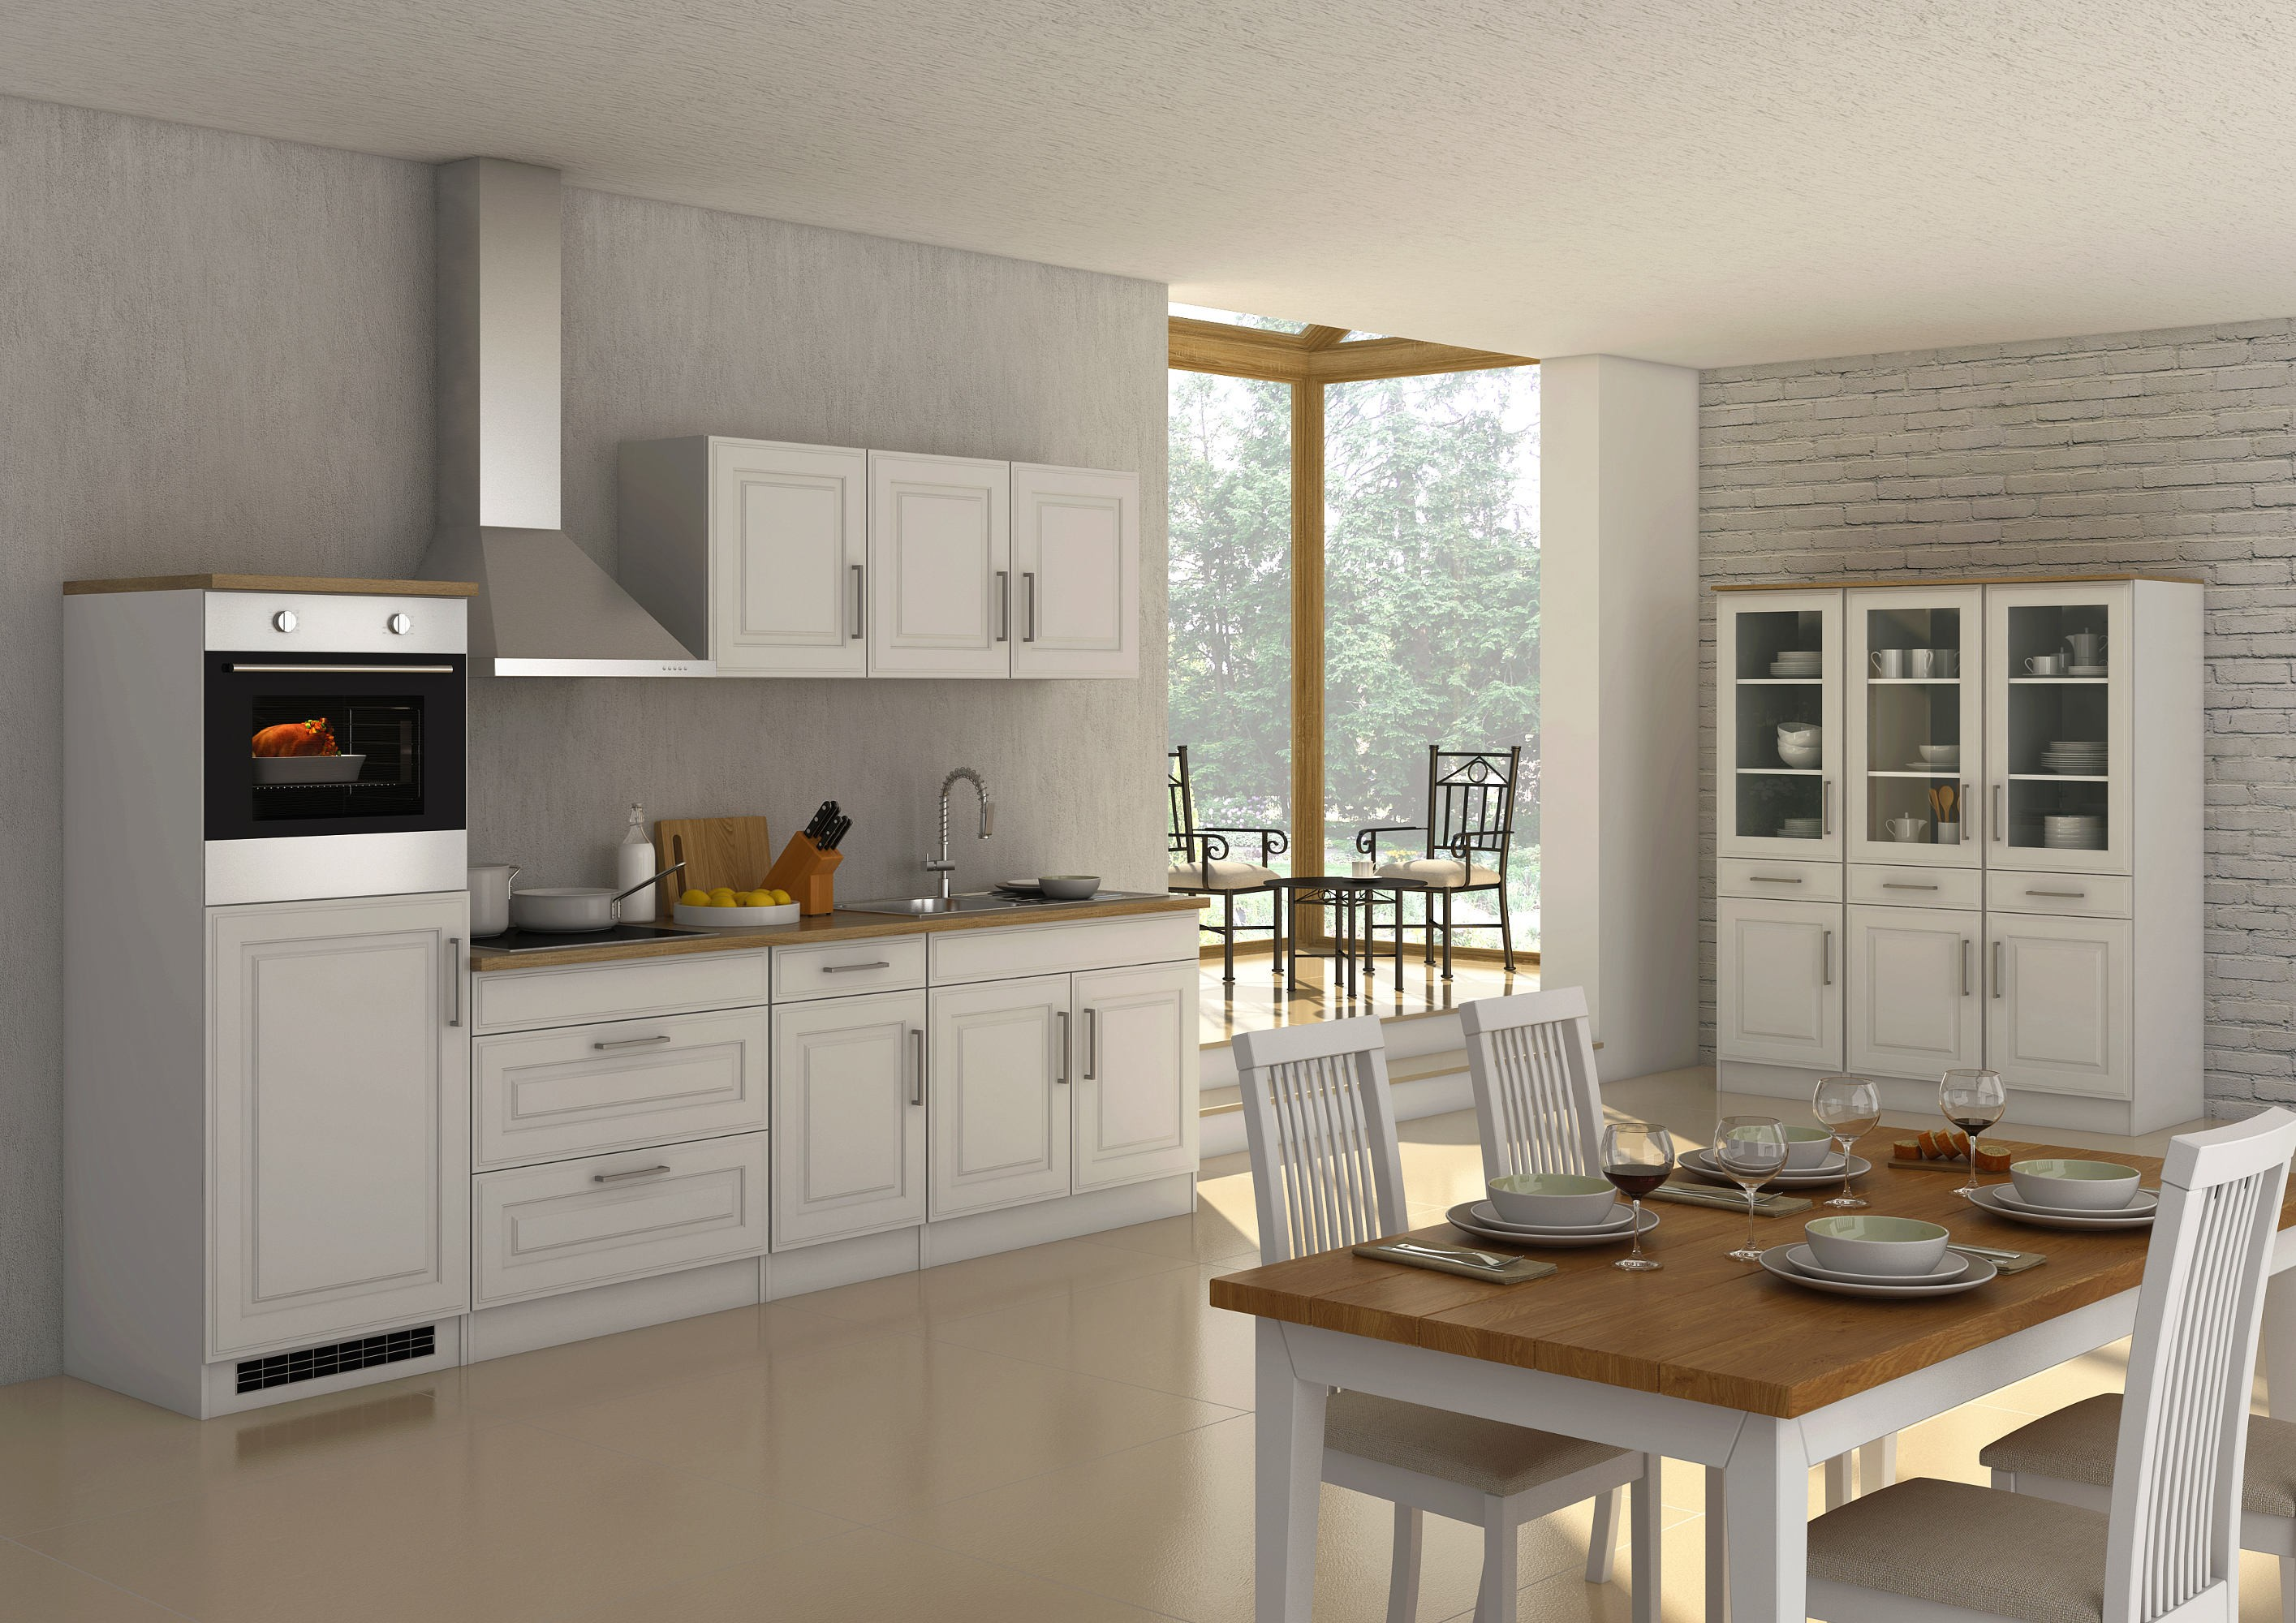 k chen h ngeschrank k ln 2 t rig breite 100 cm wei k che k chen h ngeschr nke. Black Bedroom Furniture Sets. Home Design Ideas